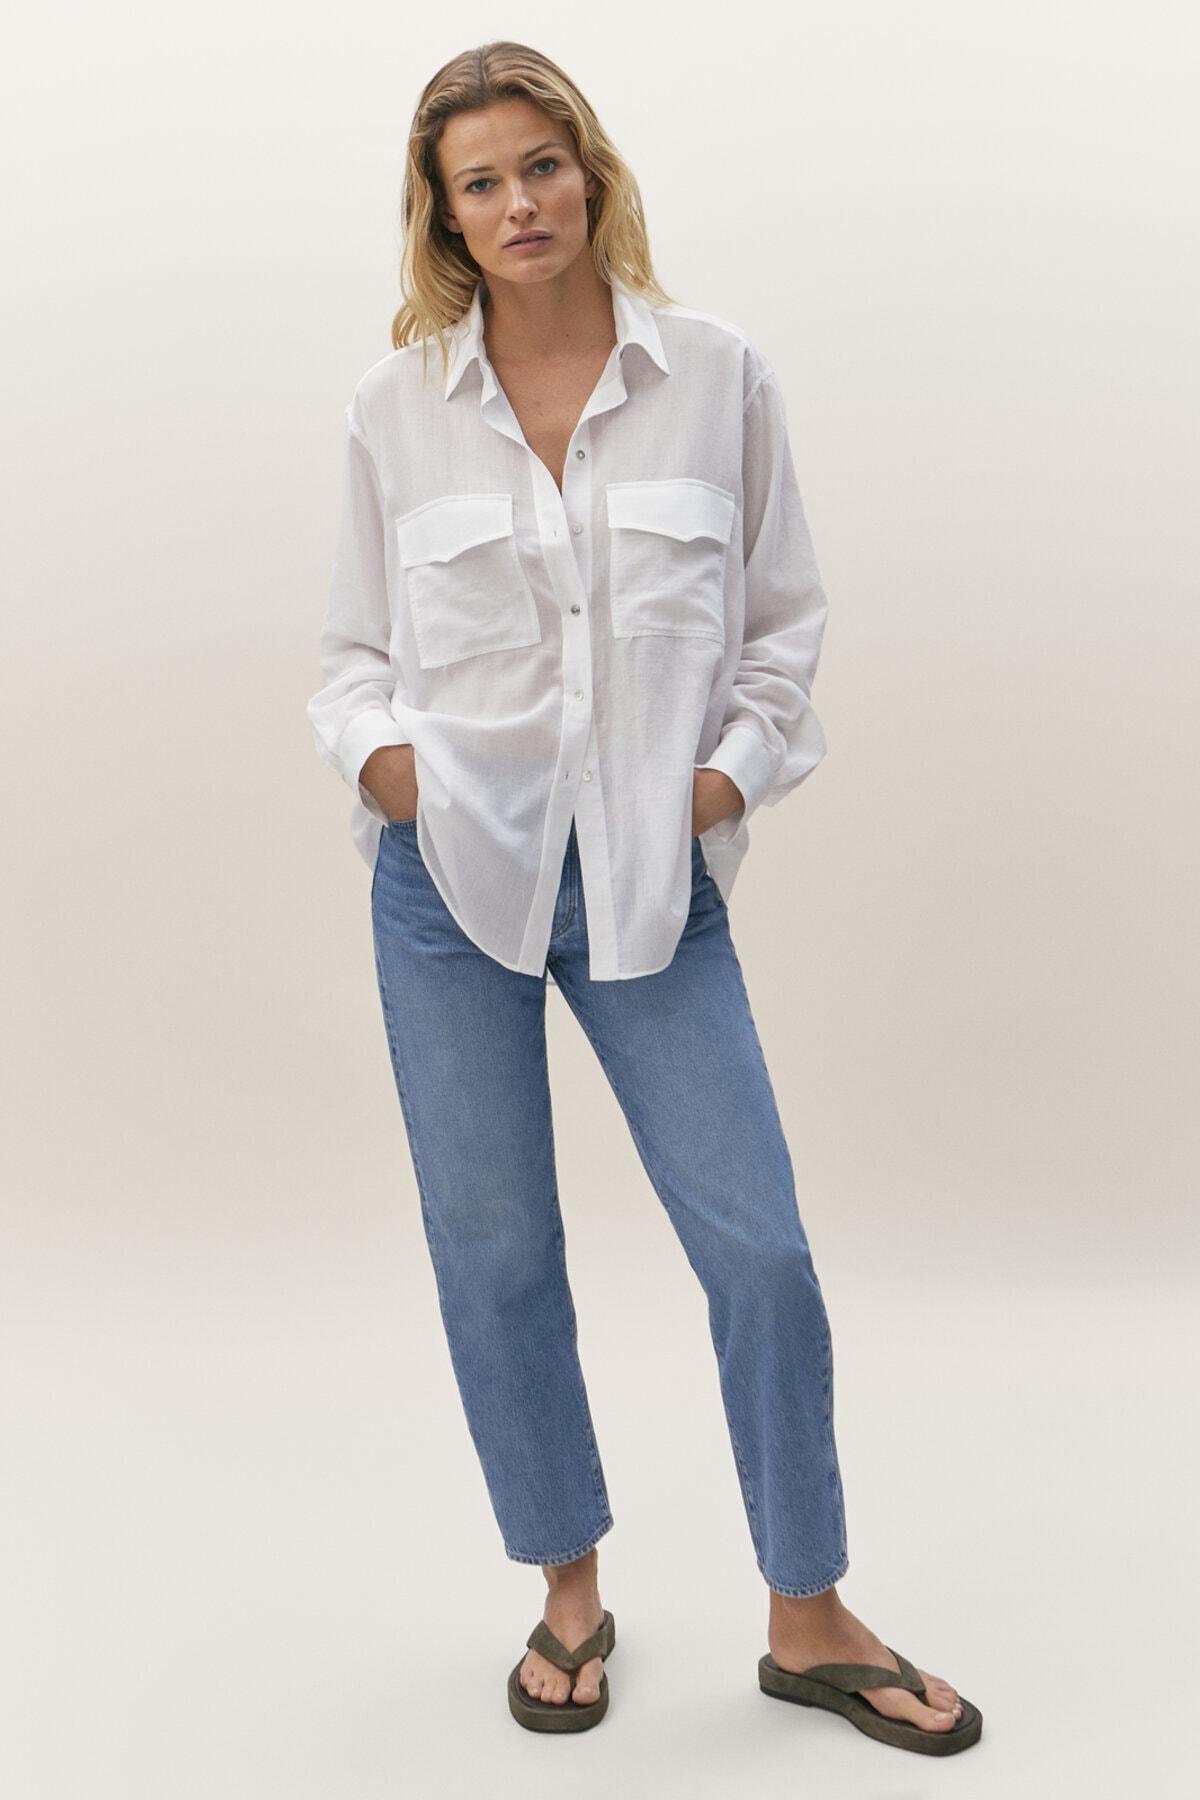 Massimo Dutti Kadın Straight Fit Yüksek Bel Jean 05054528